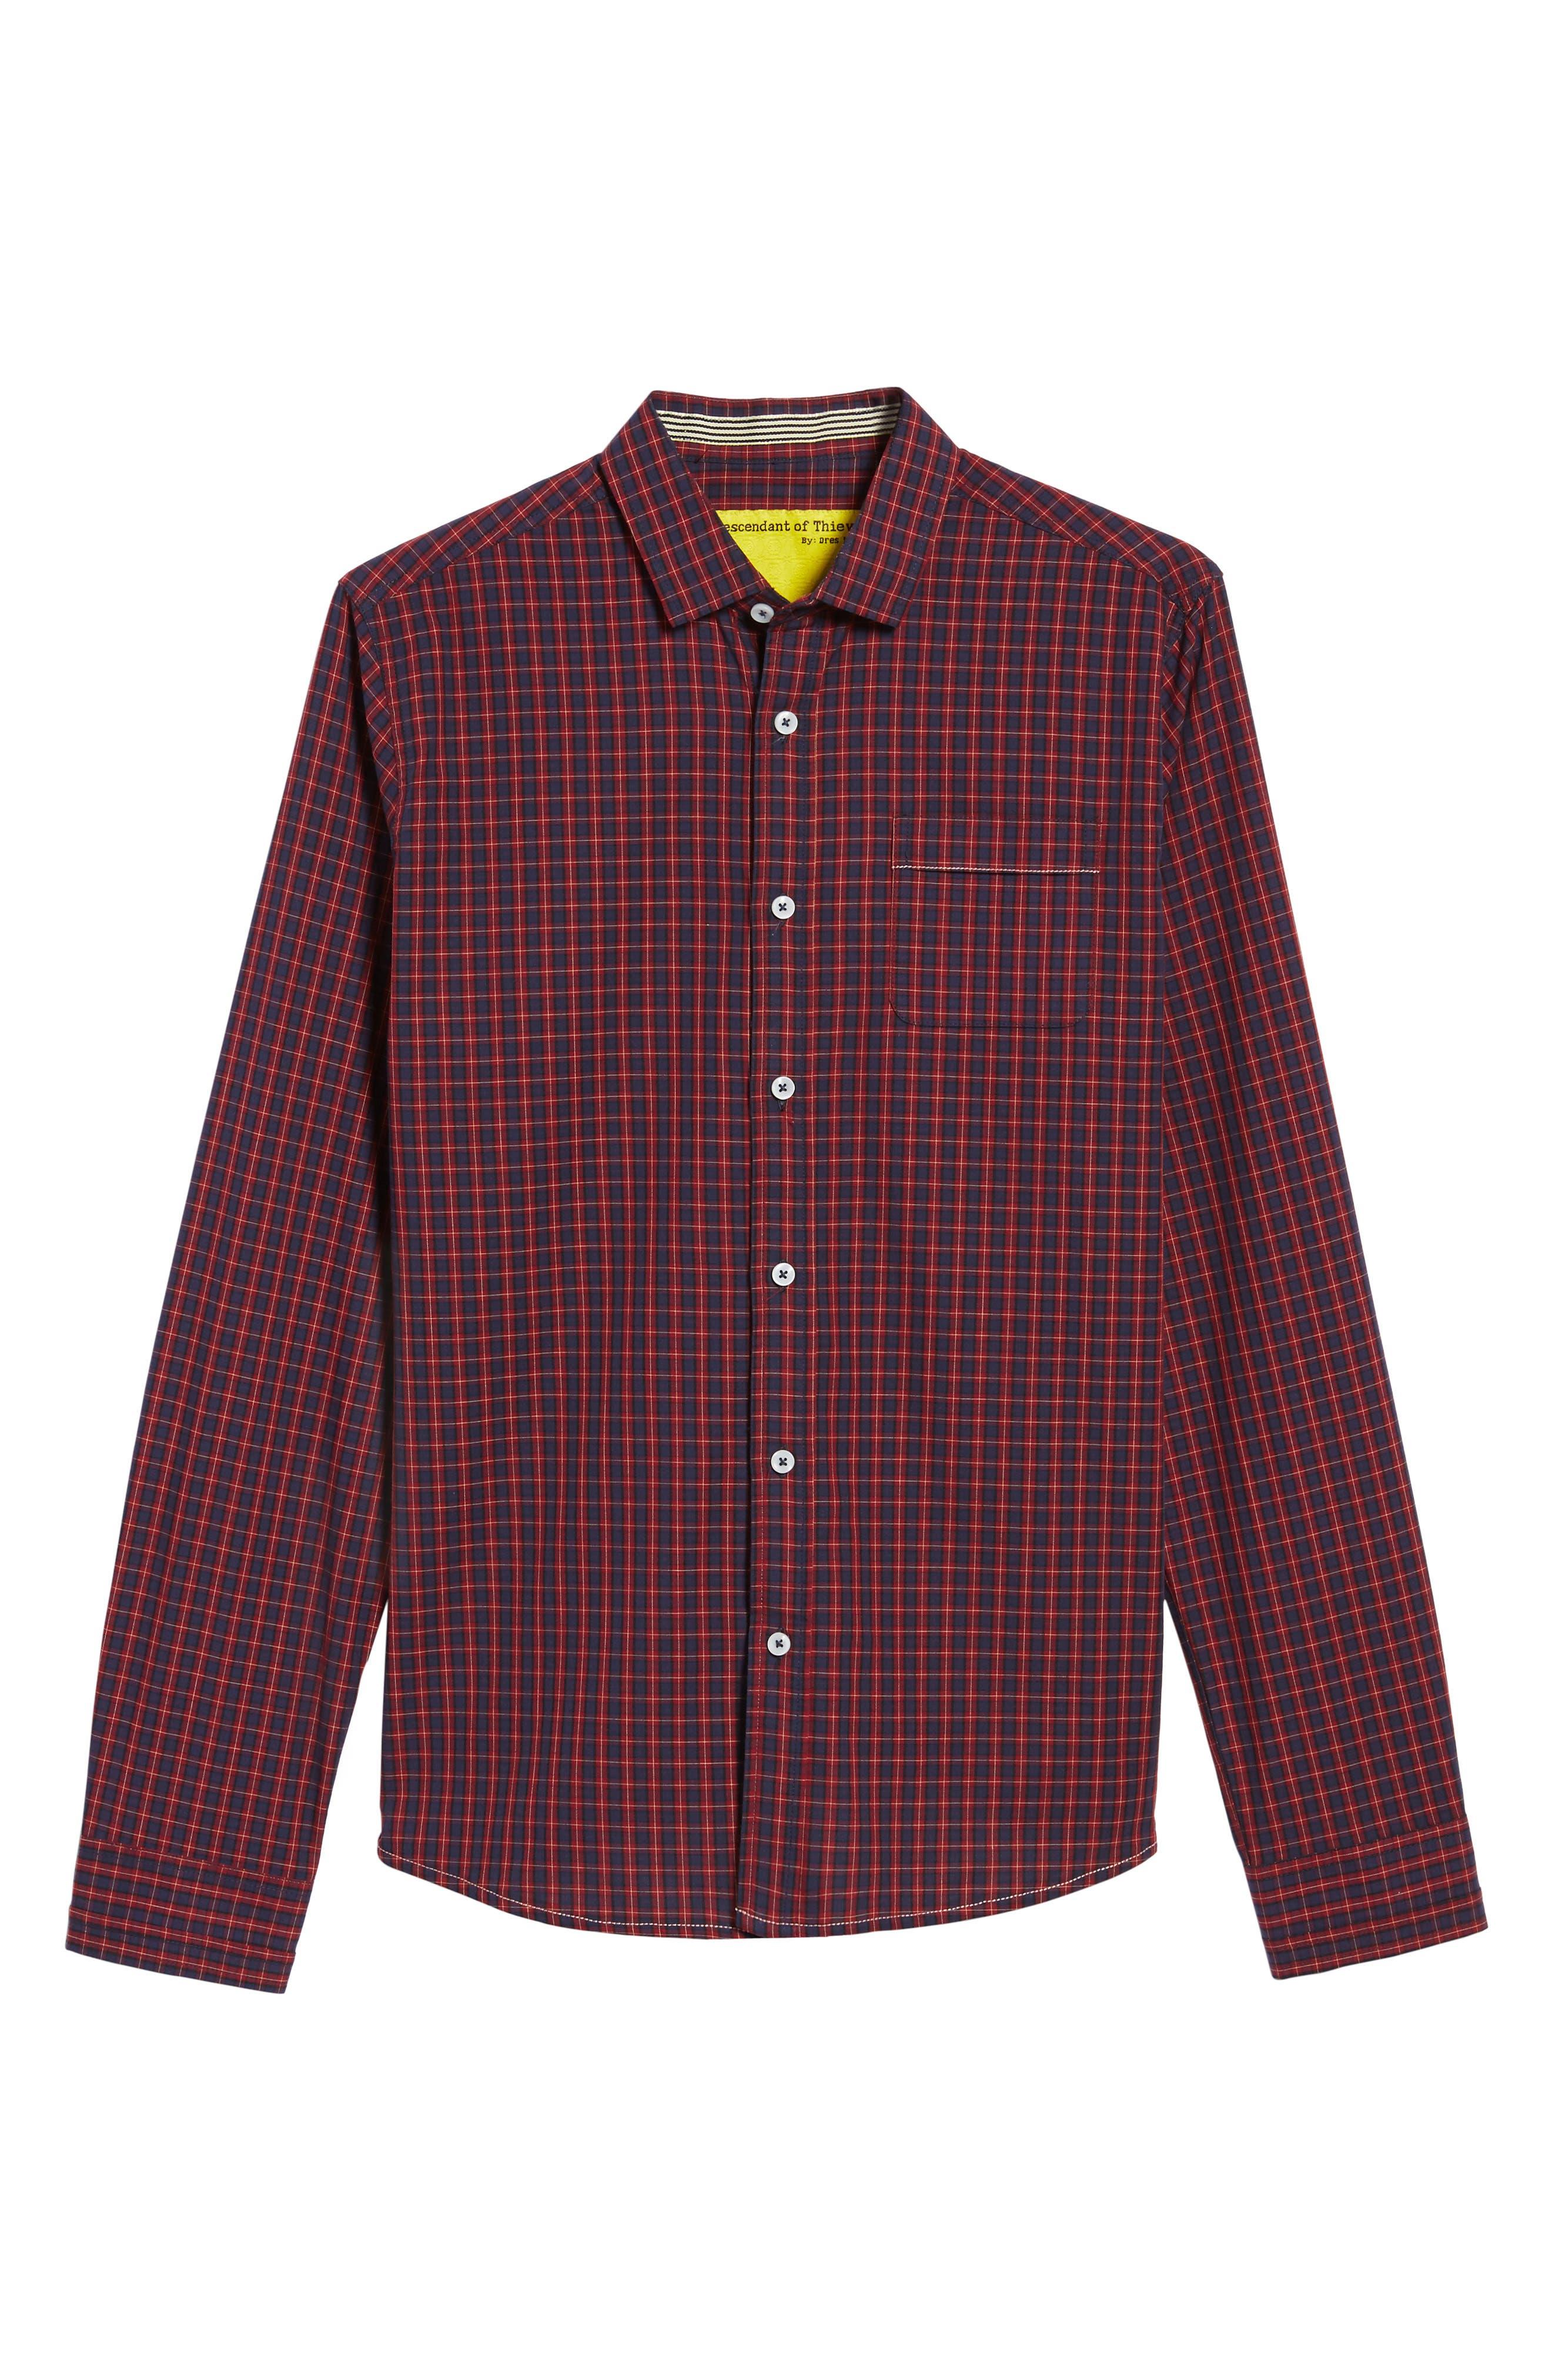 Tinto Plaid Woven Shirt,                             Alternate thumbnail 6, color,                             600